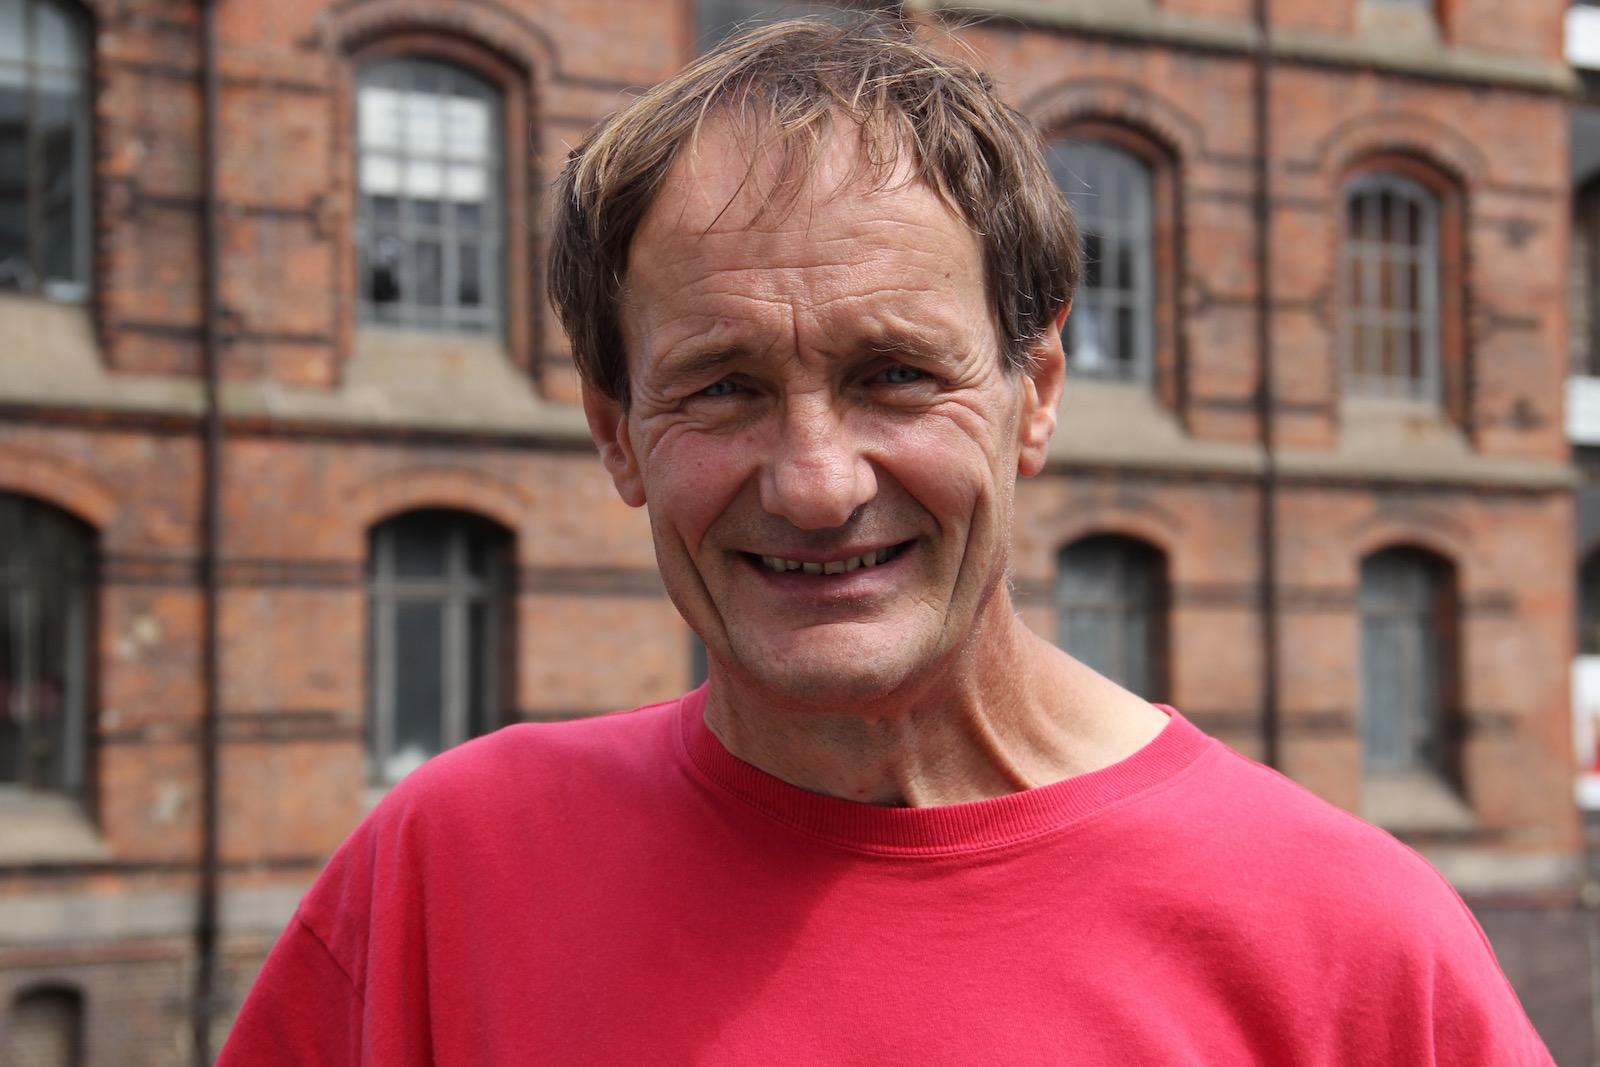 Botaniker Jürgen Feder Porträt